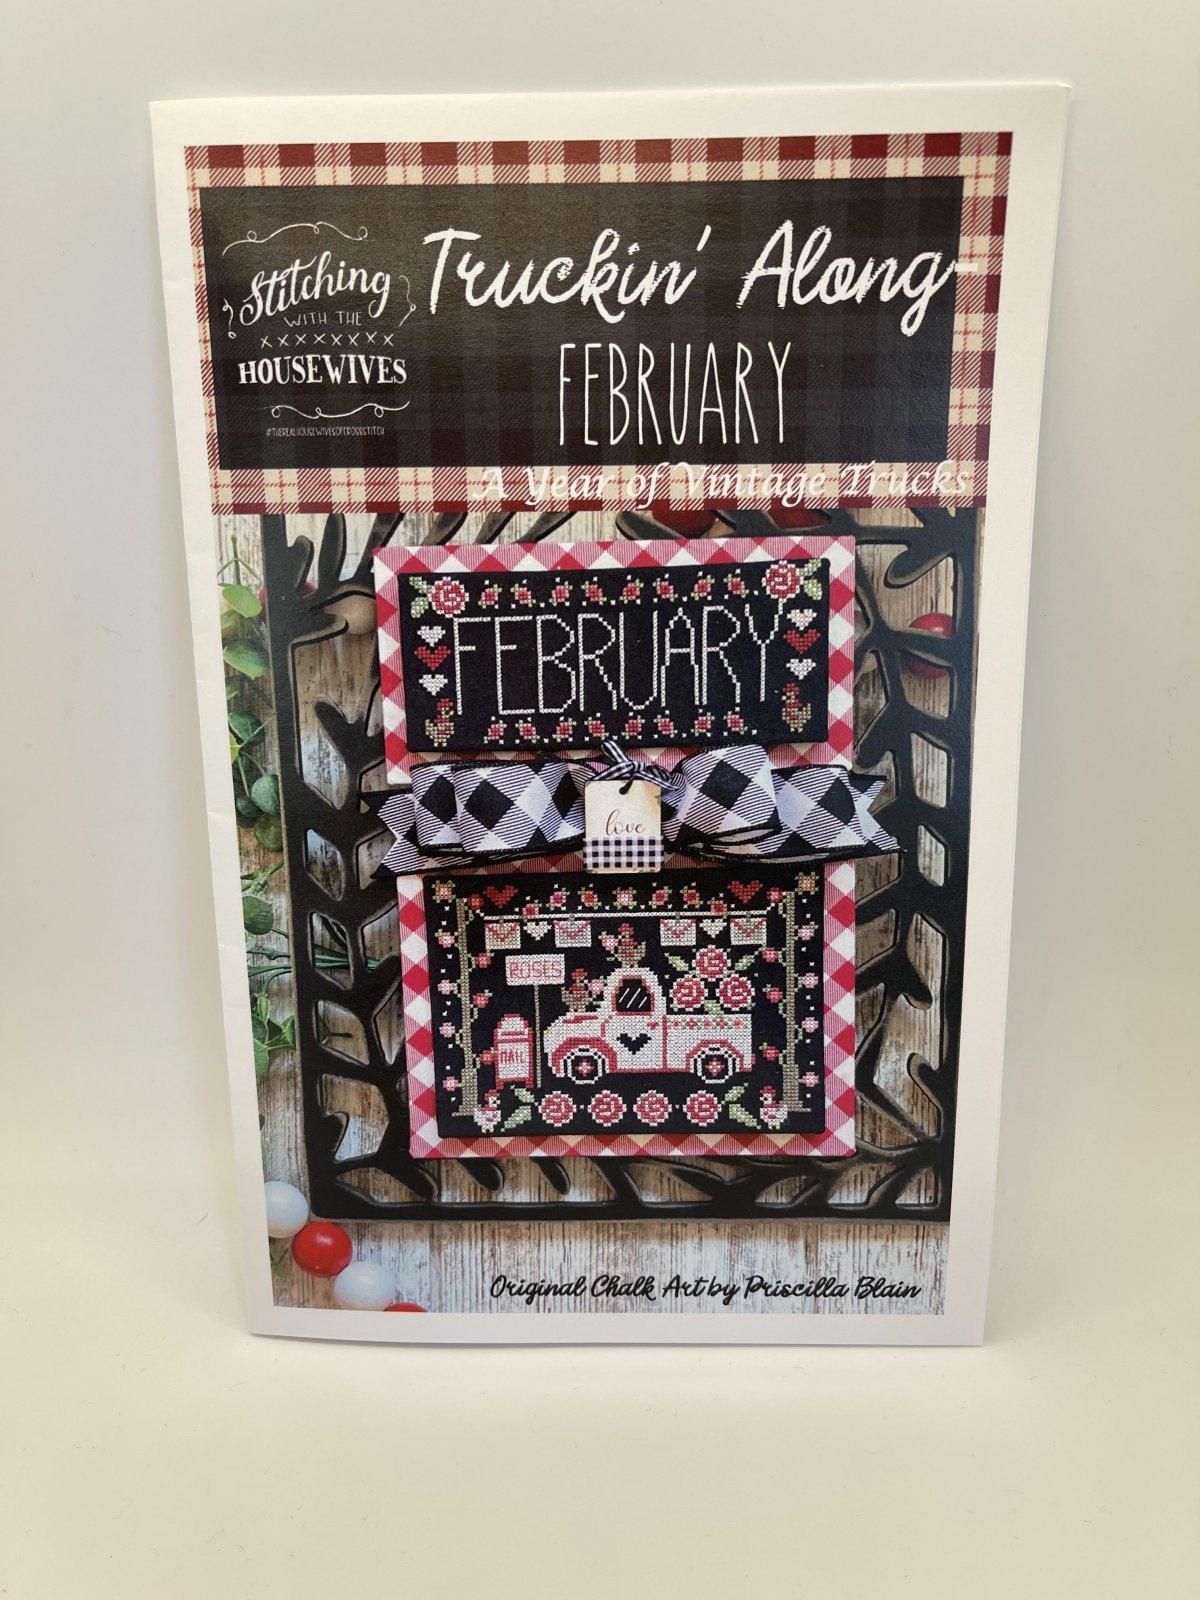 Truckin' Along February